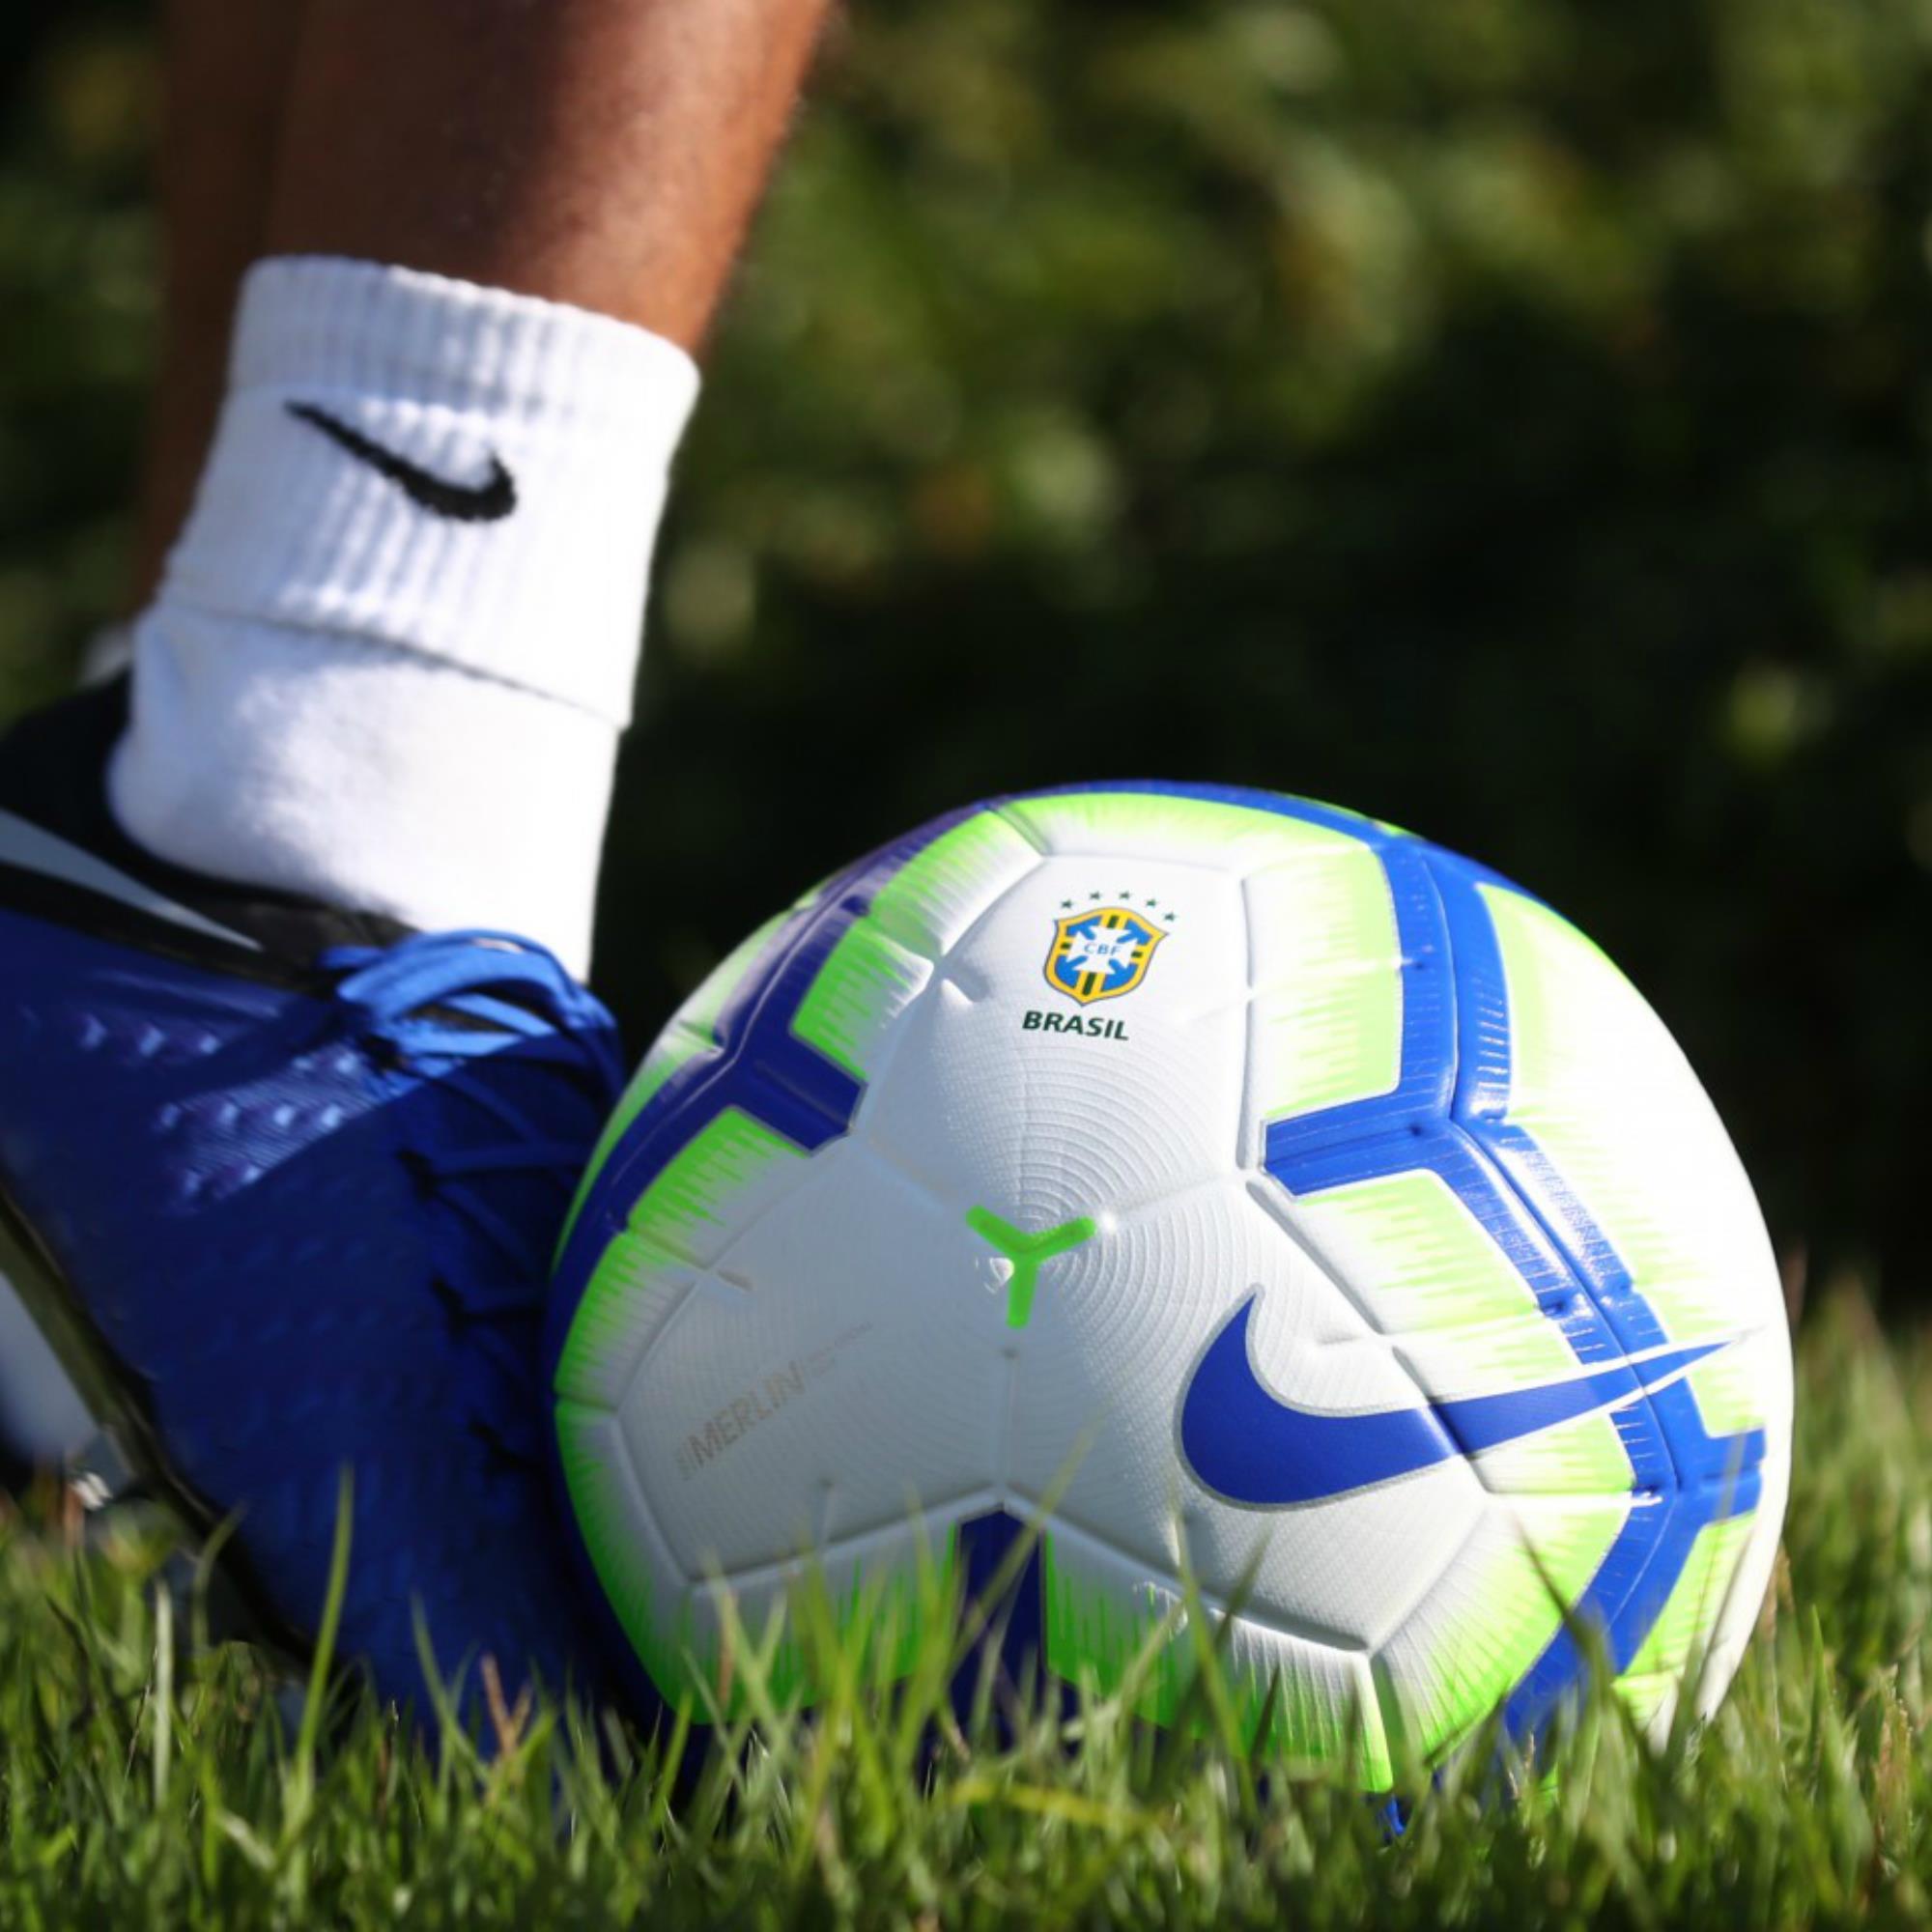 Bola Nike Merlin Ordem Campeonato Brasileiro Oficial